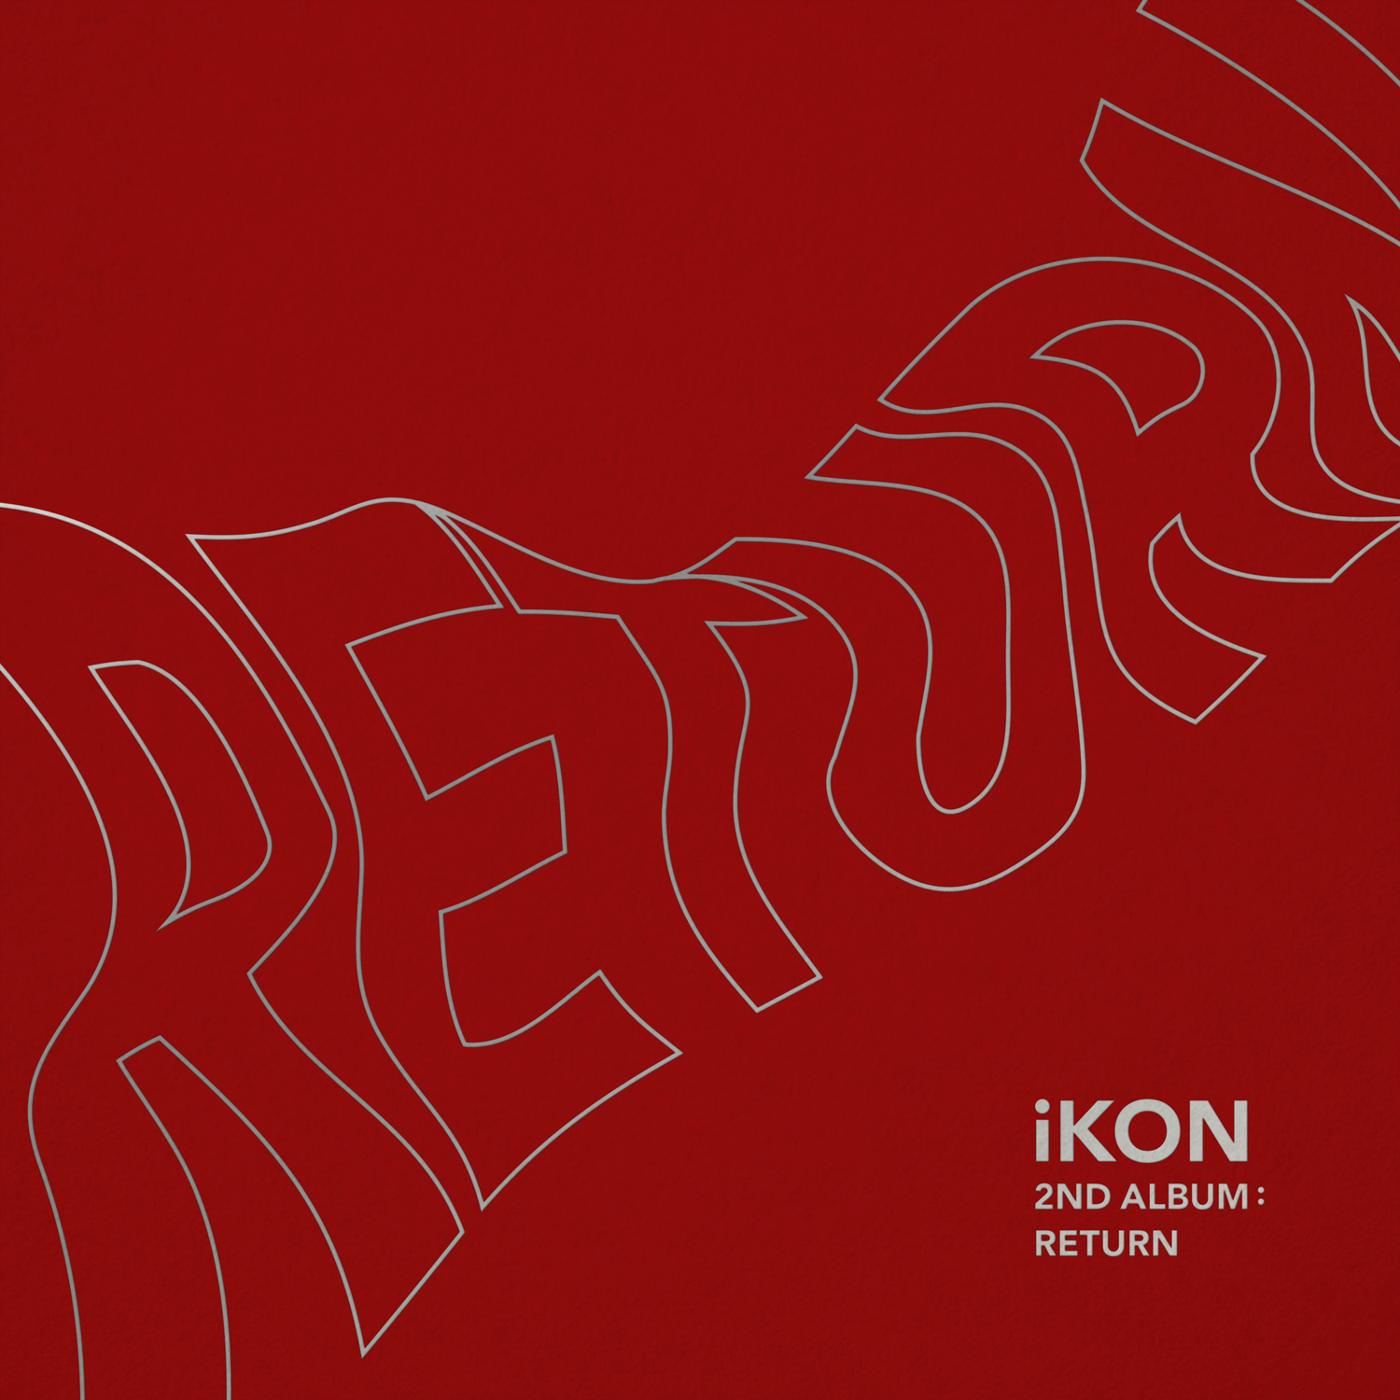 「ikon return album cover」の画像検索結果